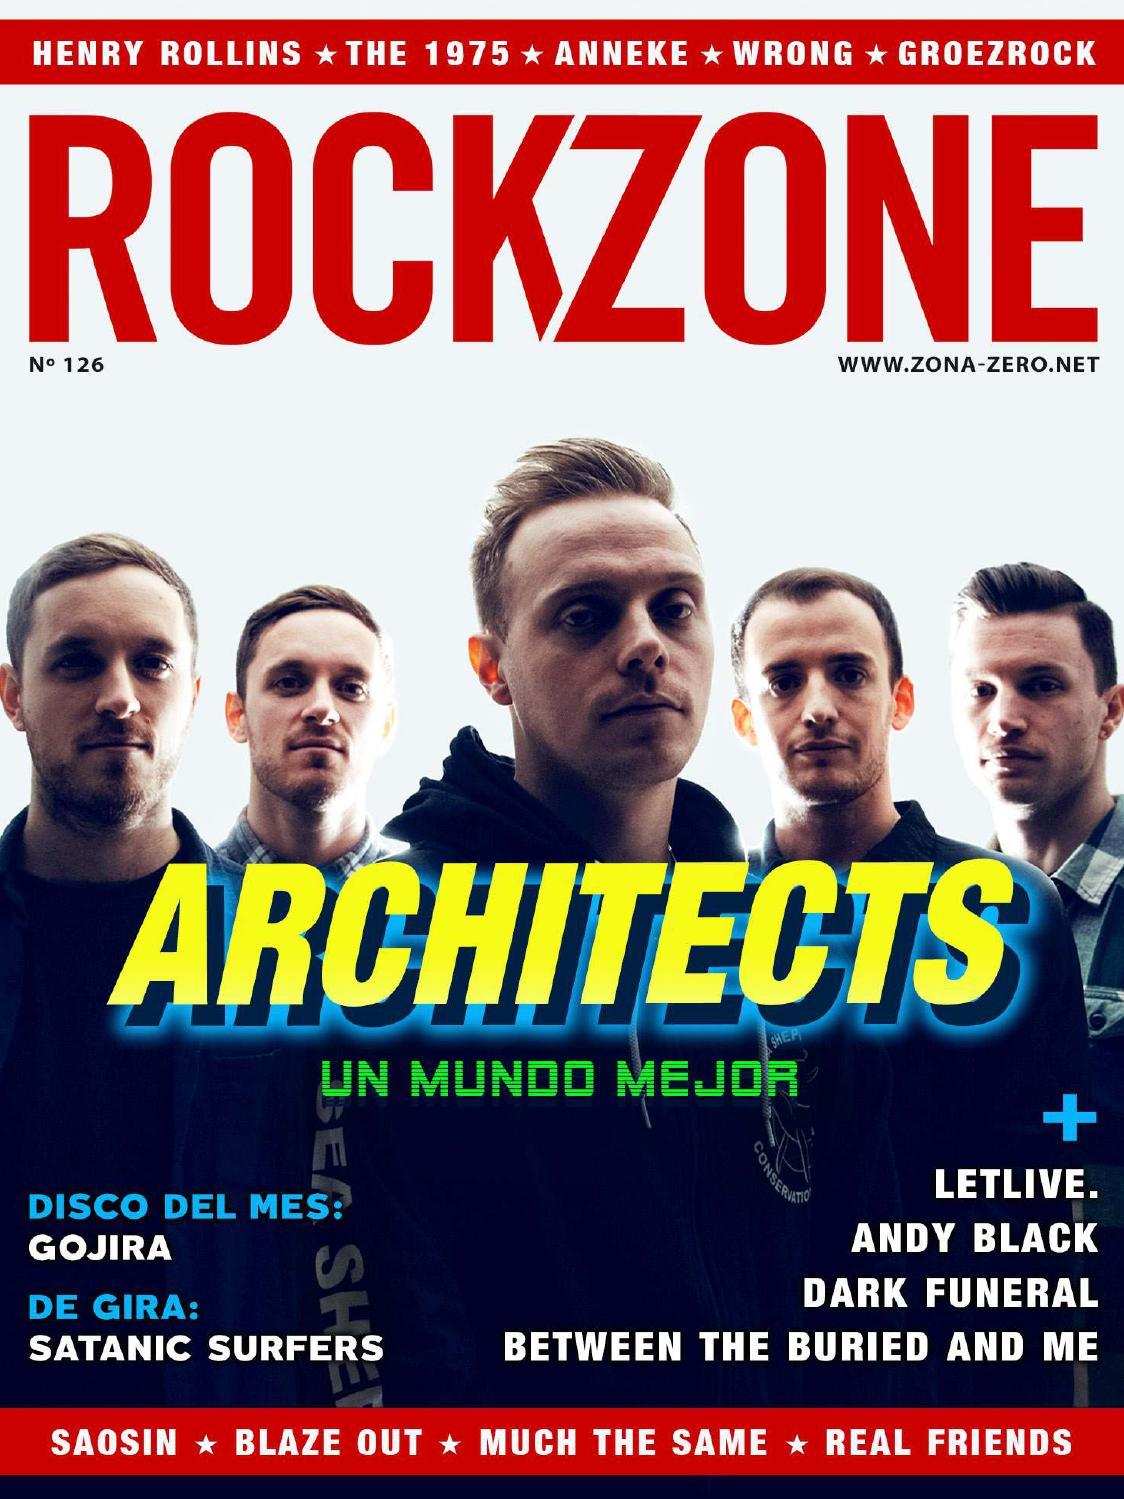 Cabreada Porn rockzone 126rockzone - issuu